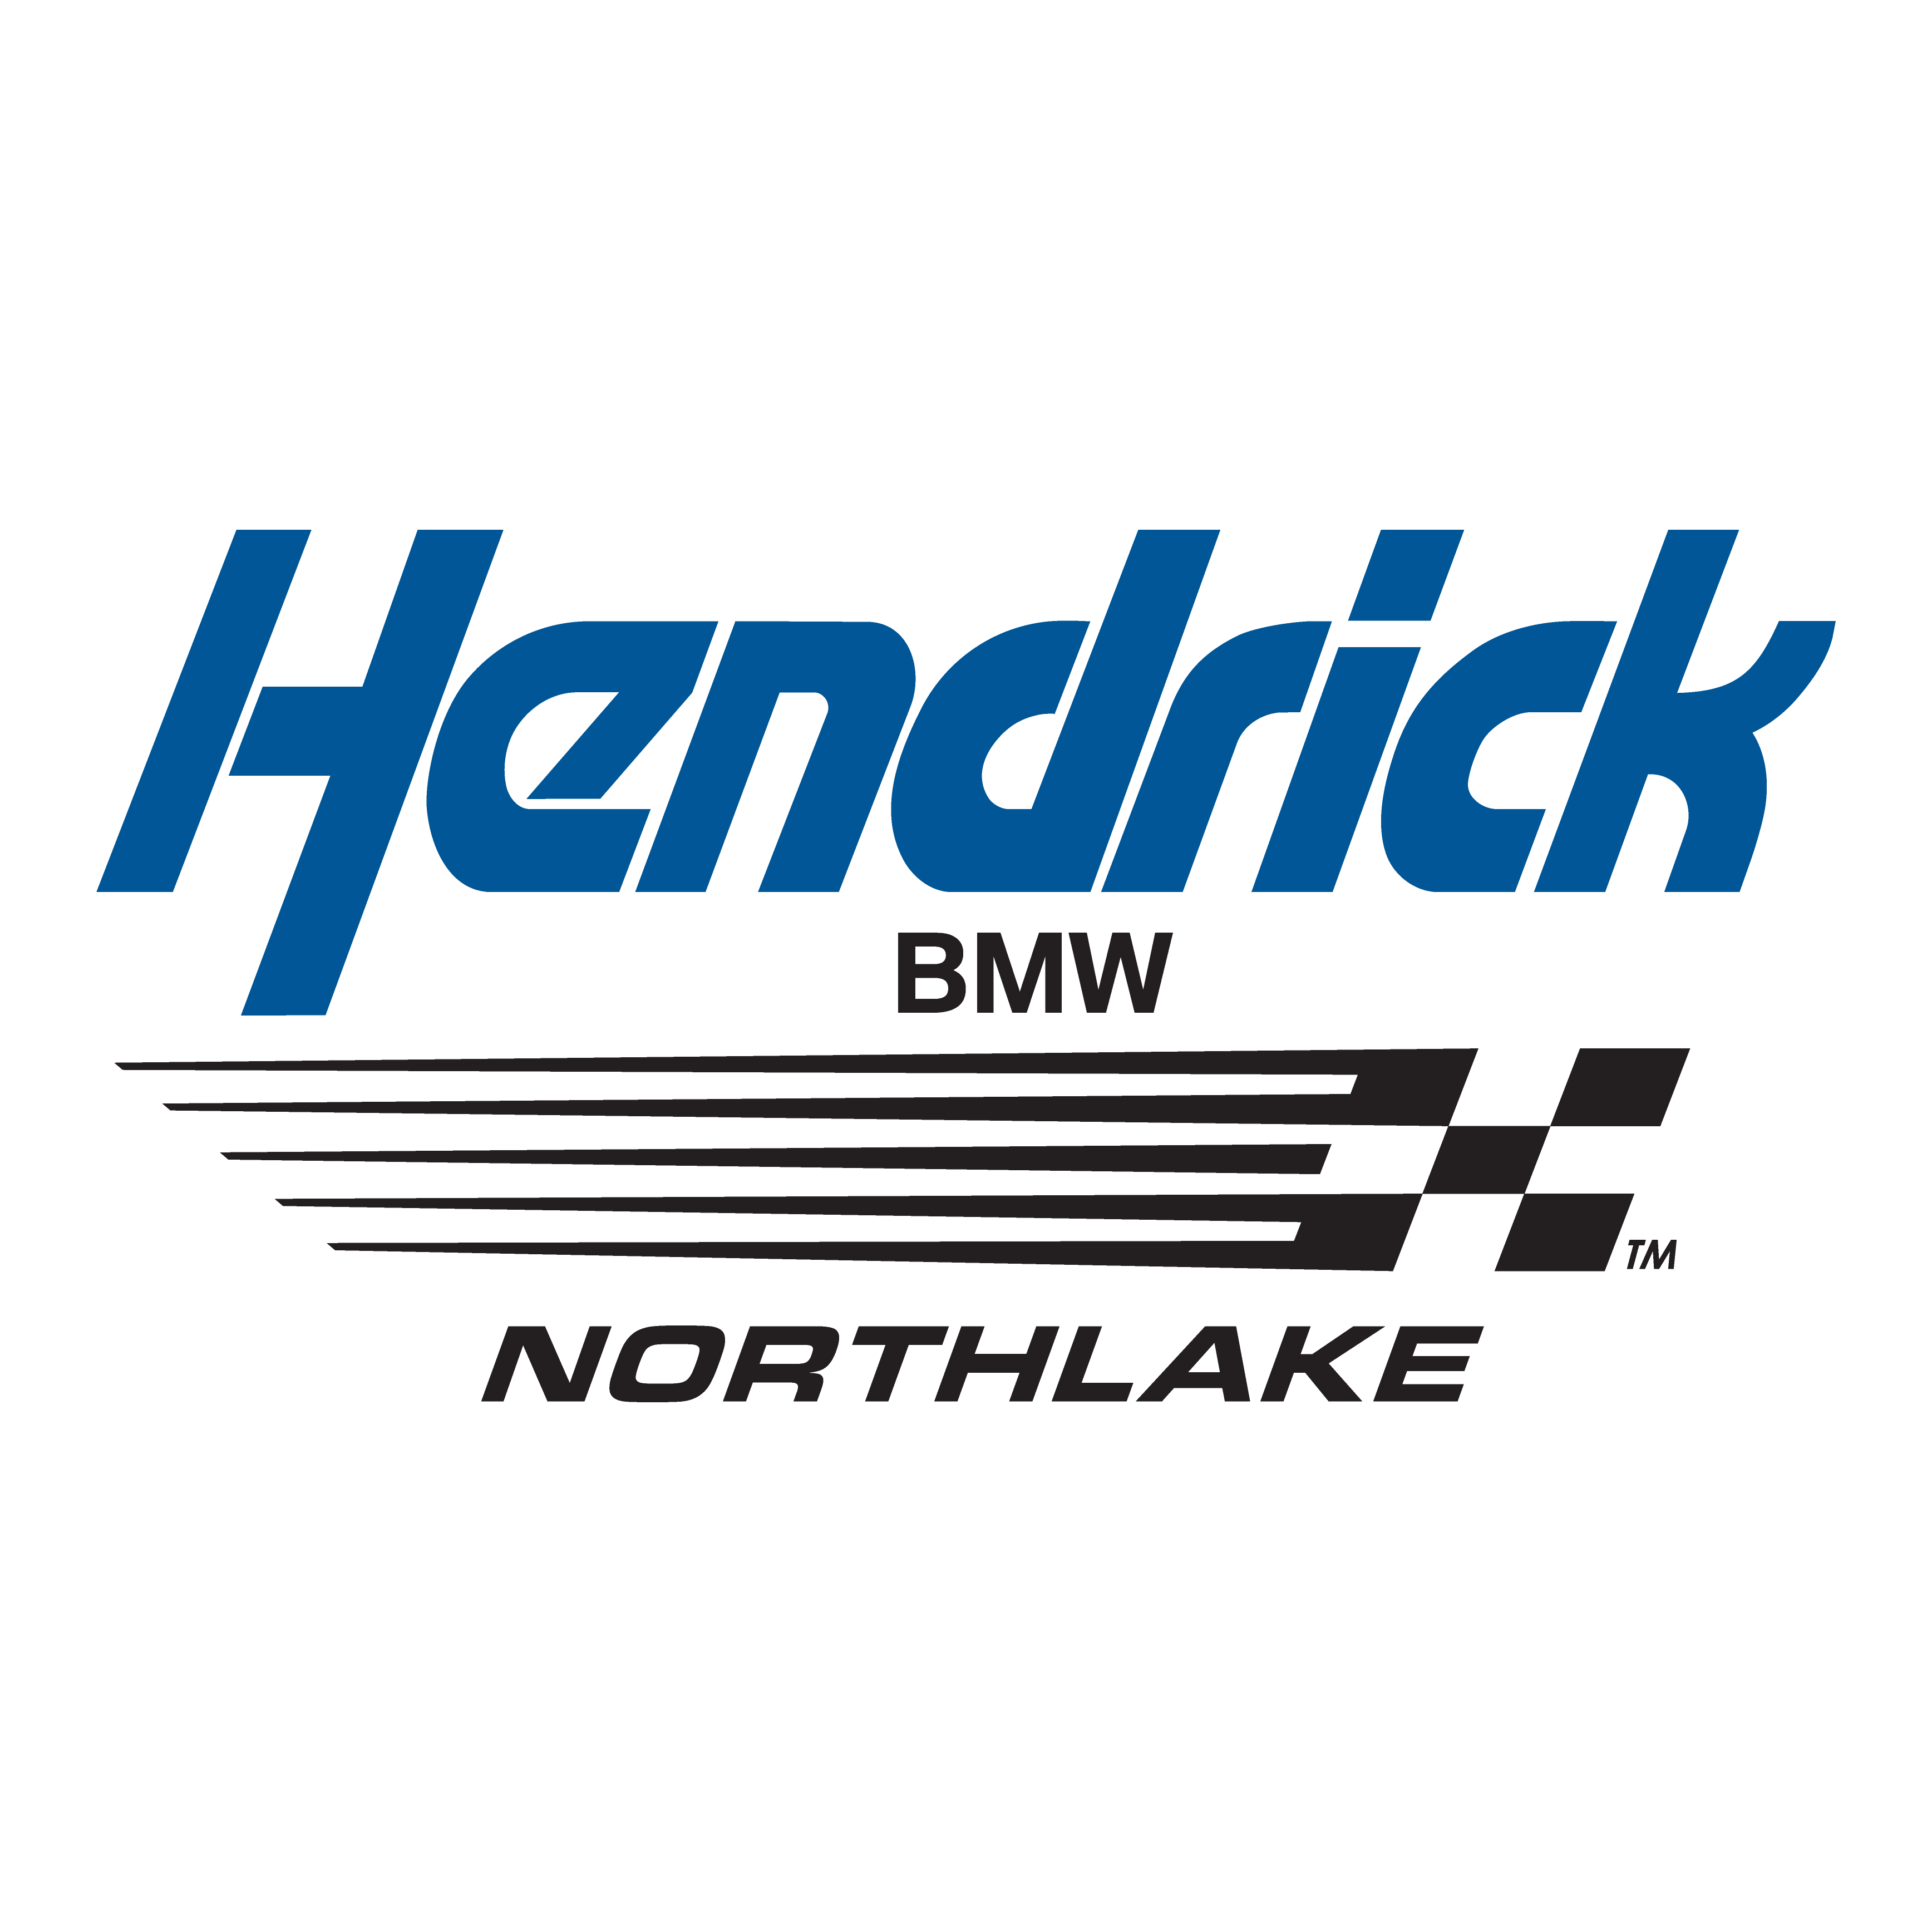 Hendrick BMW Northlake image 10